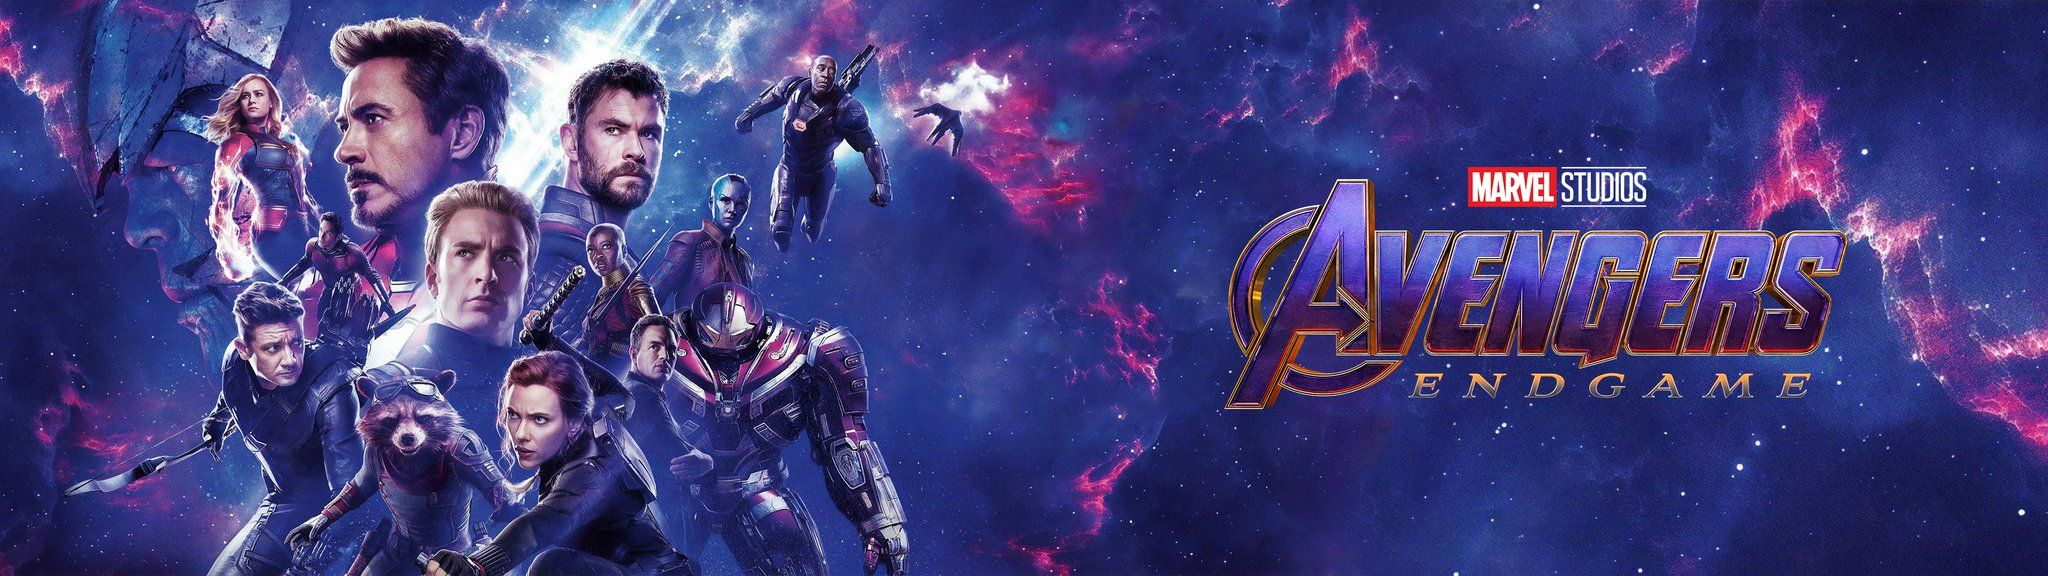 Adam Hlavac On Twitter Marvel Wallpaper Hd Dc Comics Wallpaper Endgame Poster